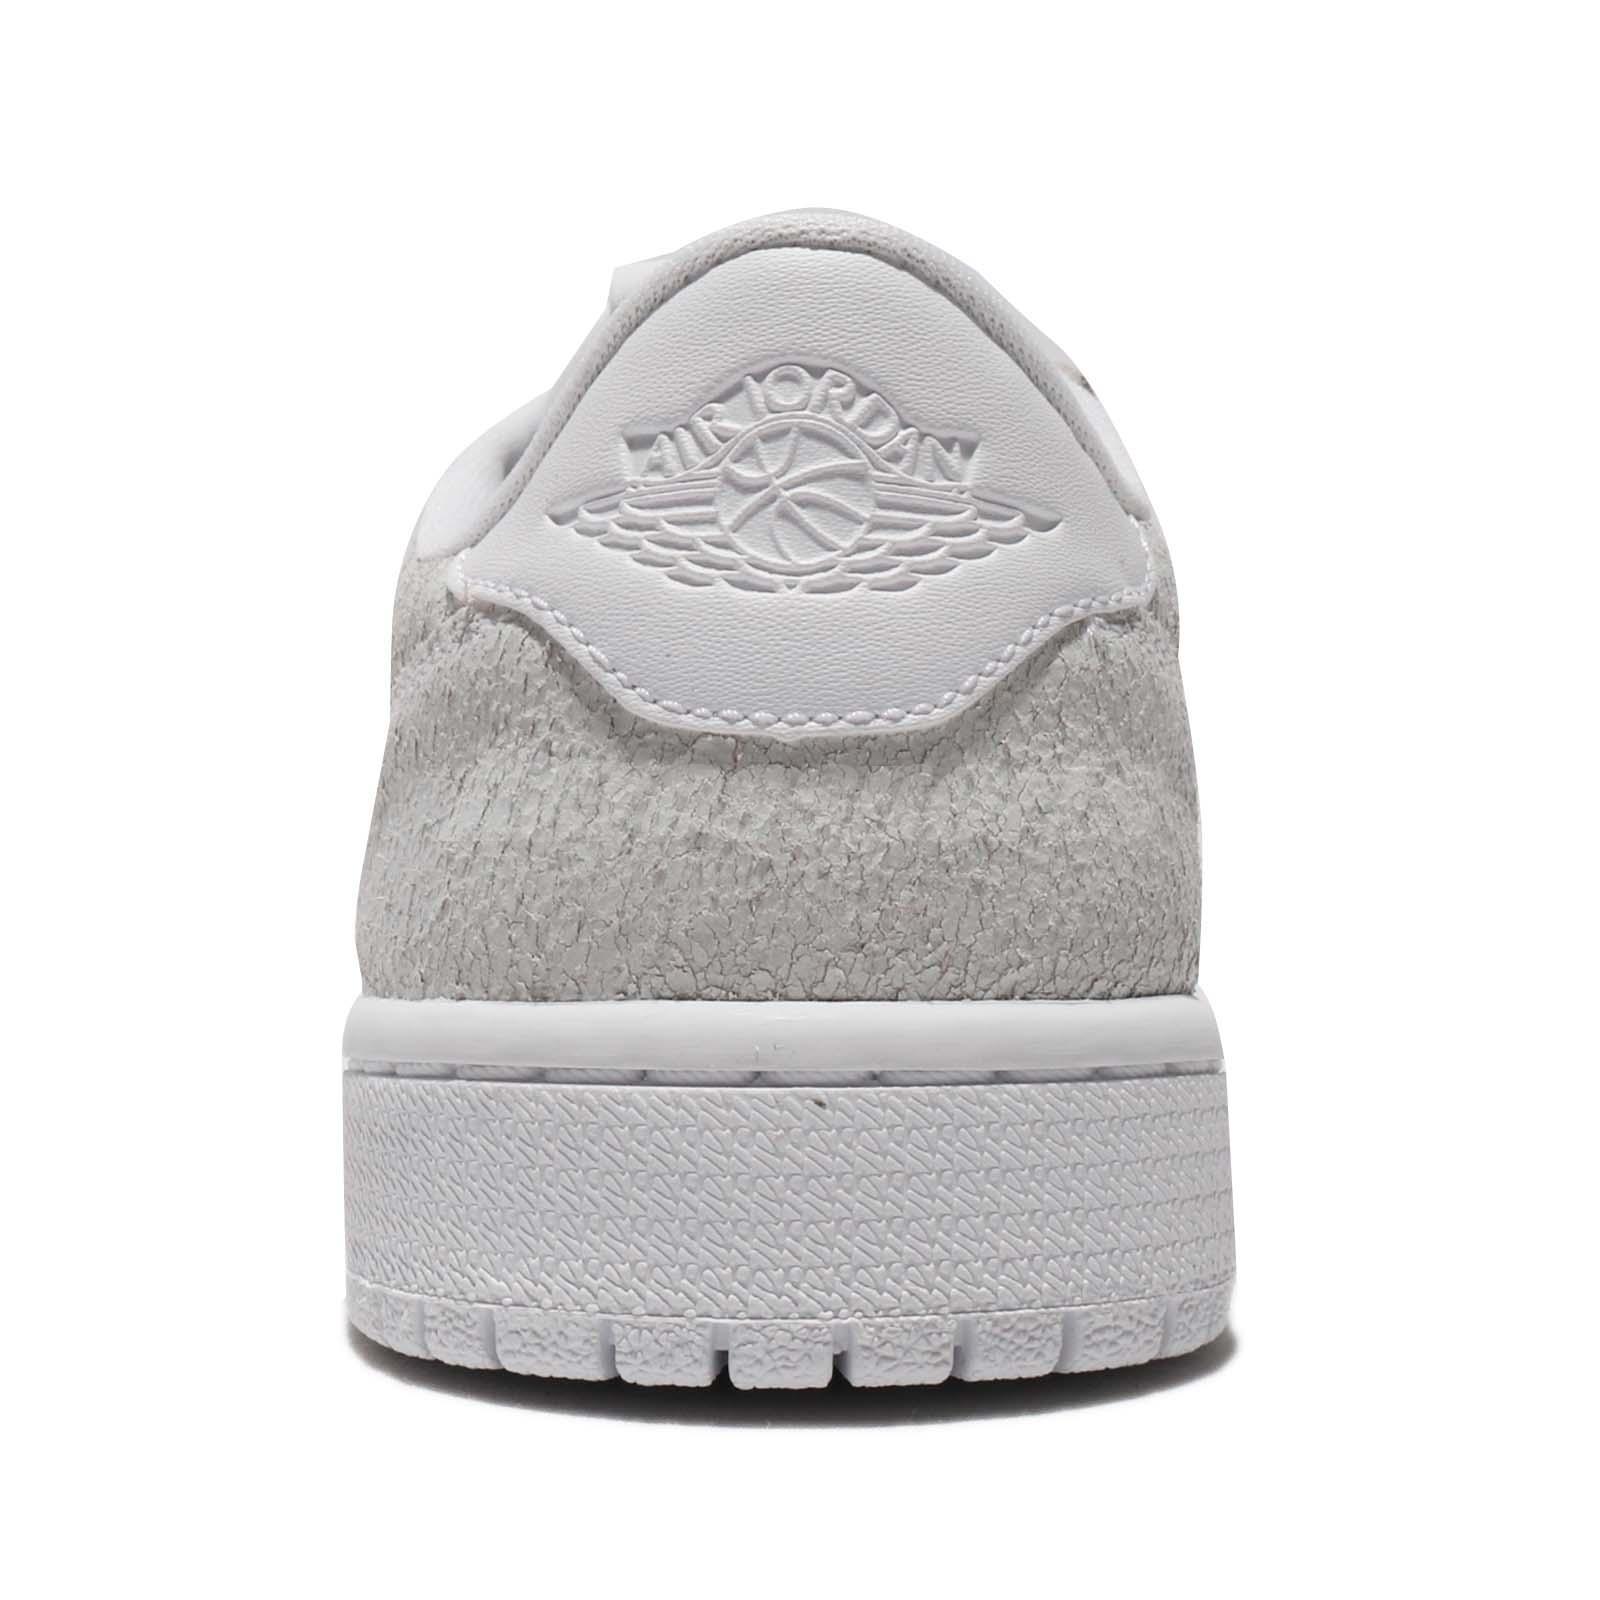 520c210669a840 Nike Wmns Air Jordan 1 Retro Low NS No Swoosh White Grey Women Shoes ...